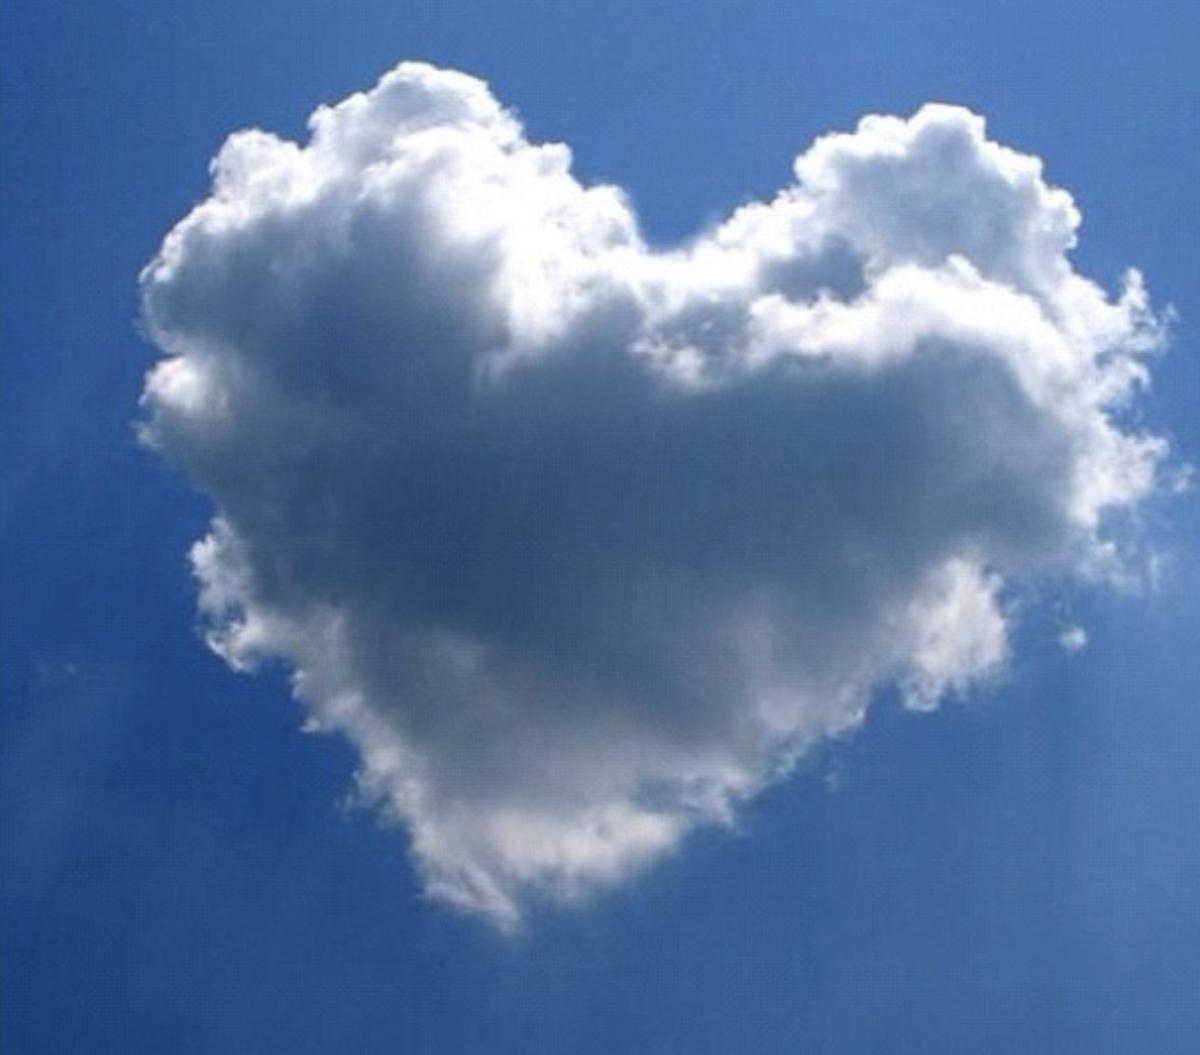 ©Art Jonak 2012 — Coolest cloud ever! — CC BY-NC 2.0